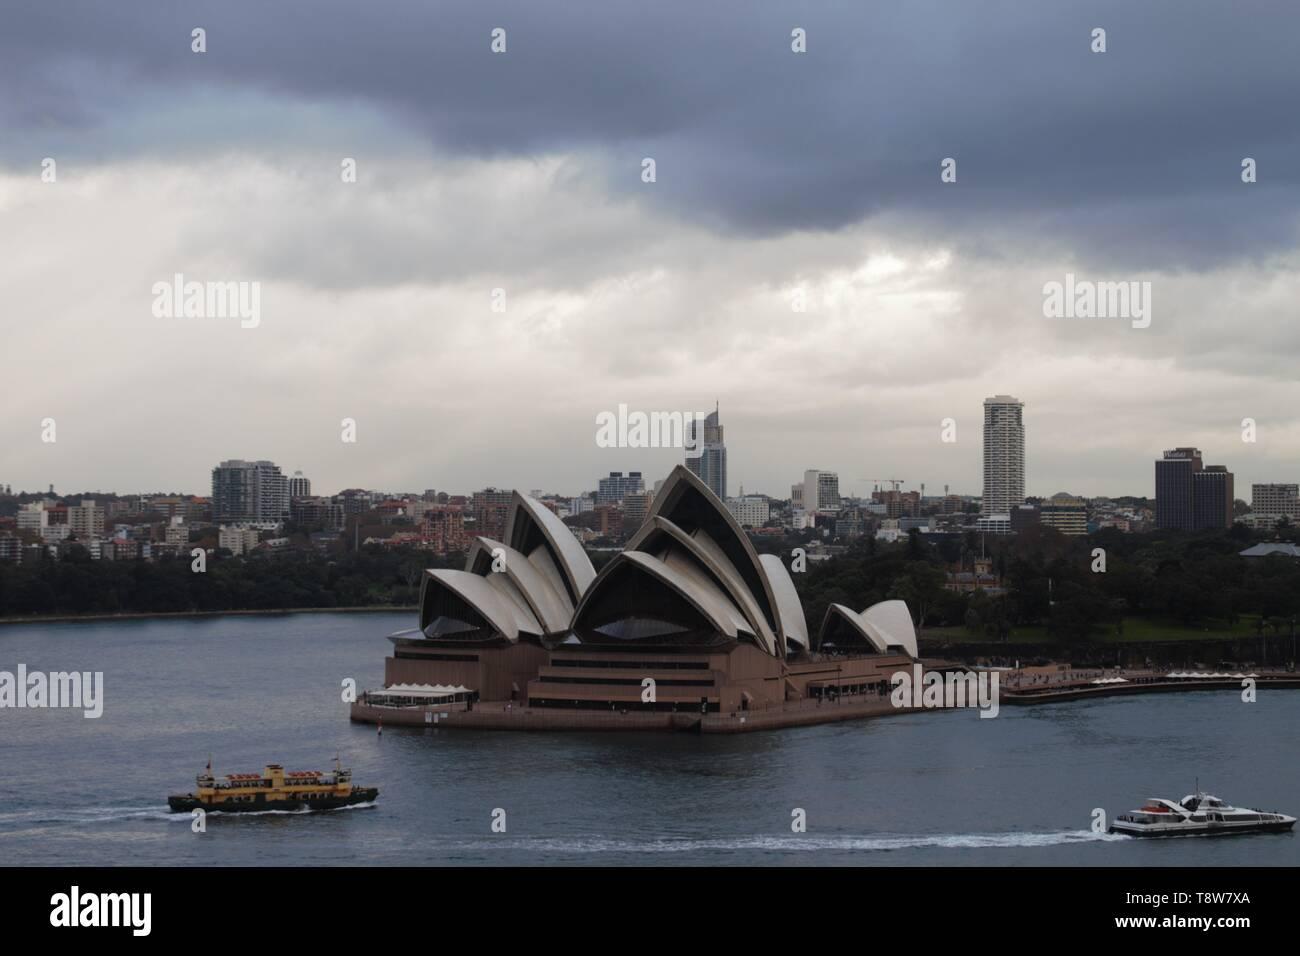 Opera house in Sydney, beautiful panorama view - Stock Image